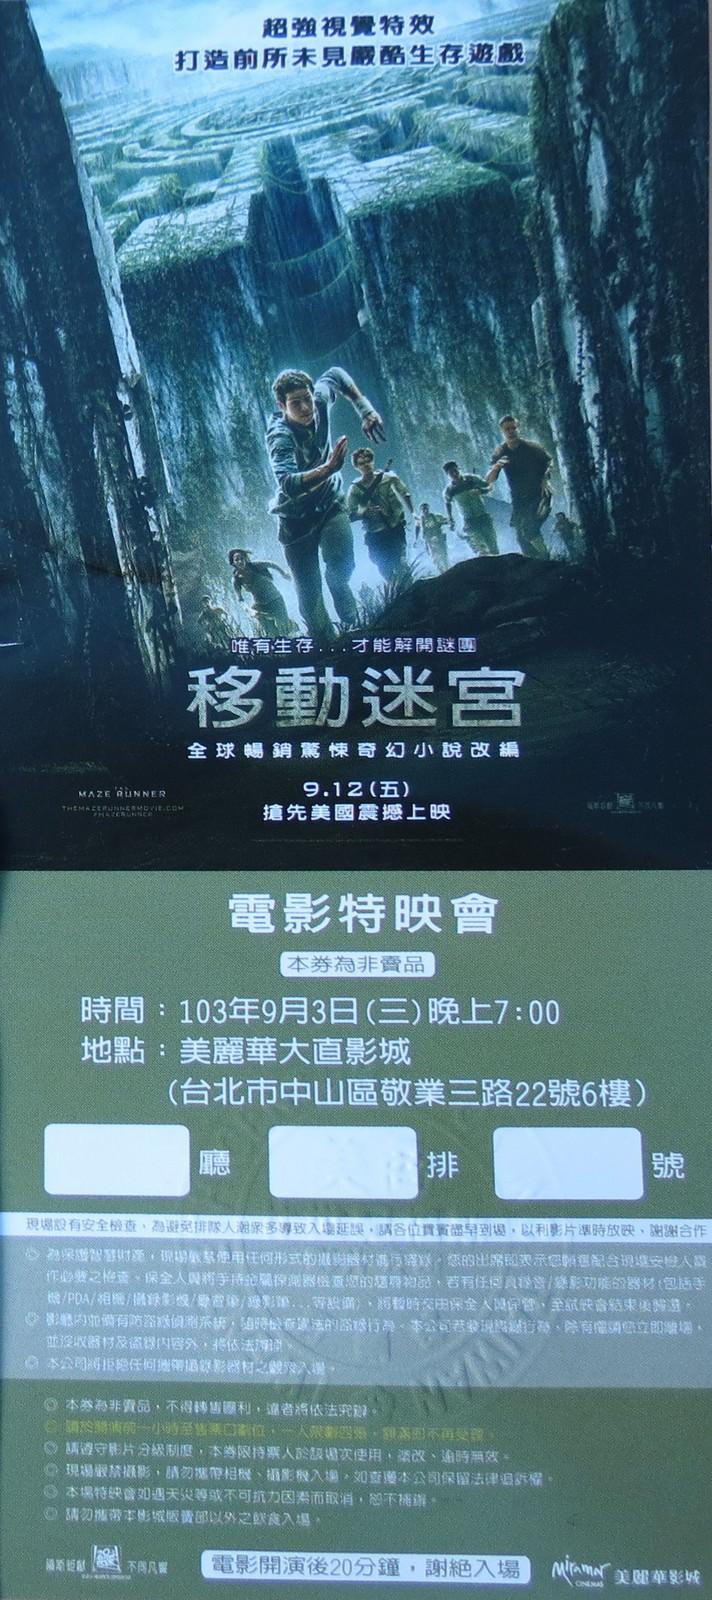 Movie, The Maze Runner(美國, 2014) / 移動迷宮(台灣.香港) / 移动迷宫(中國), 電影海報, 廣告看板, 特映會電影票